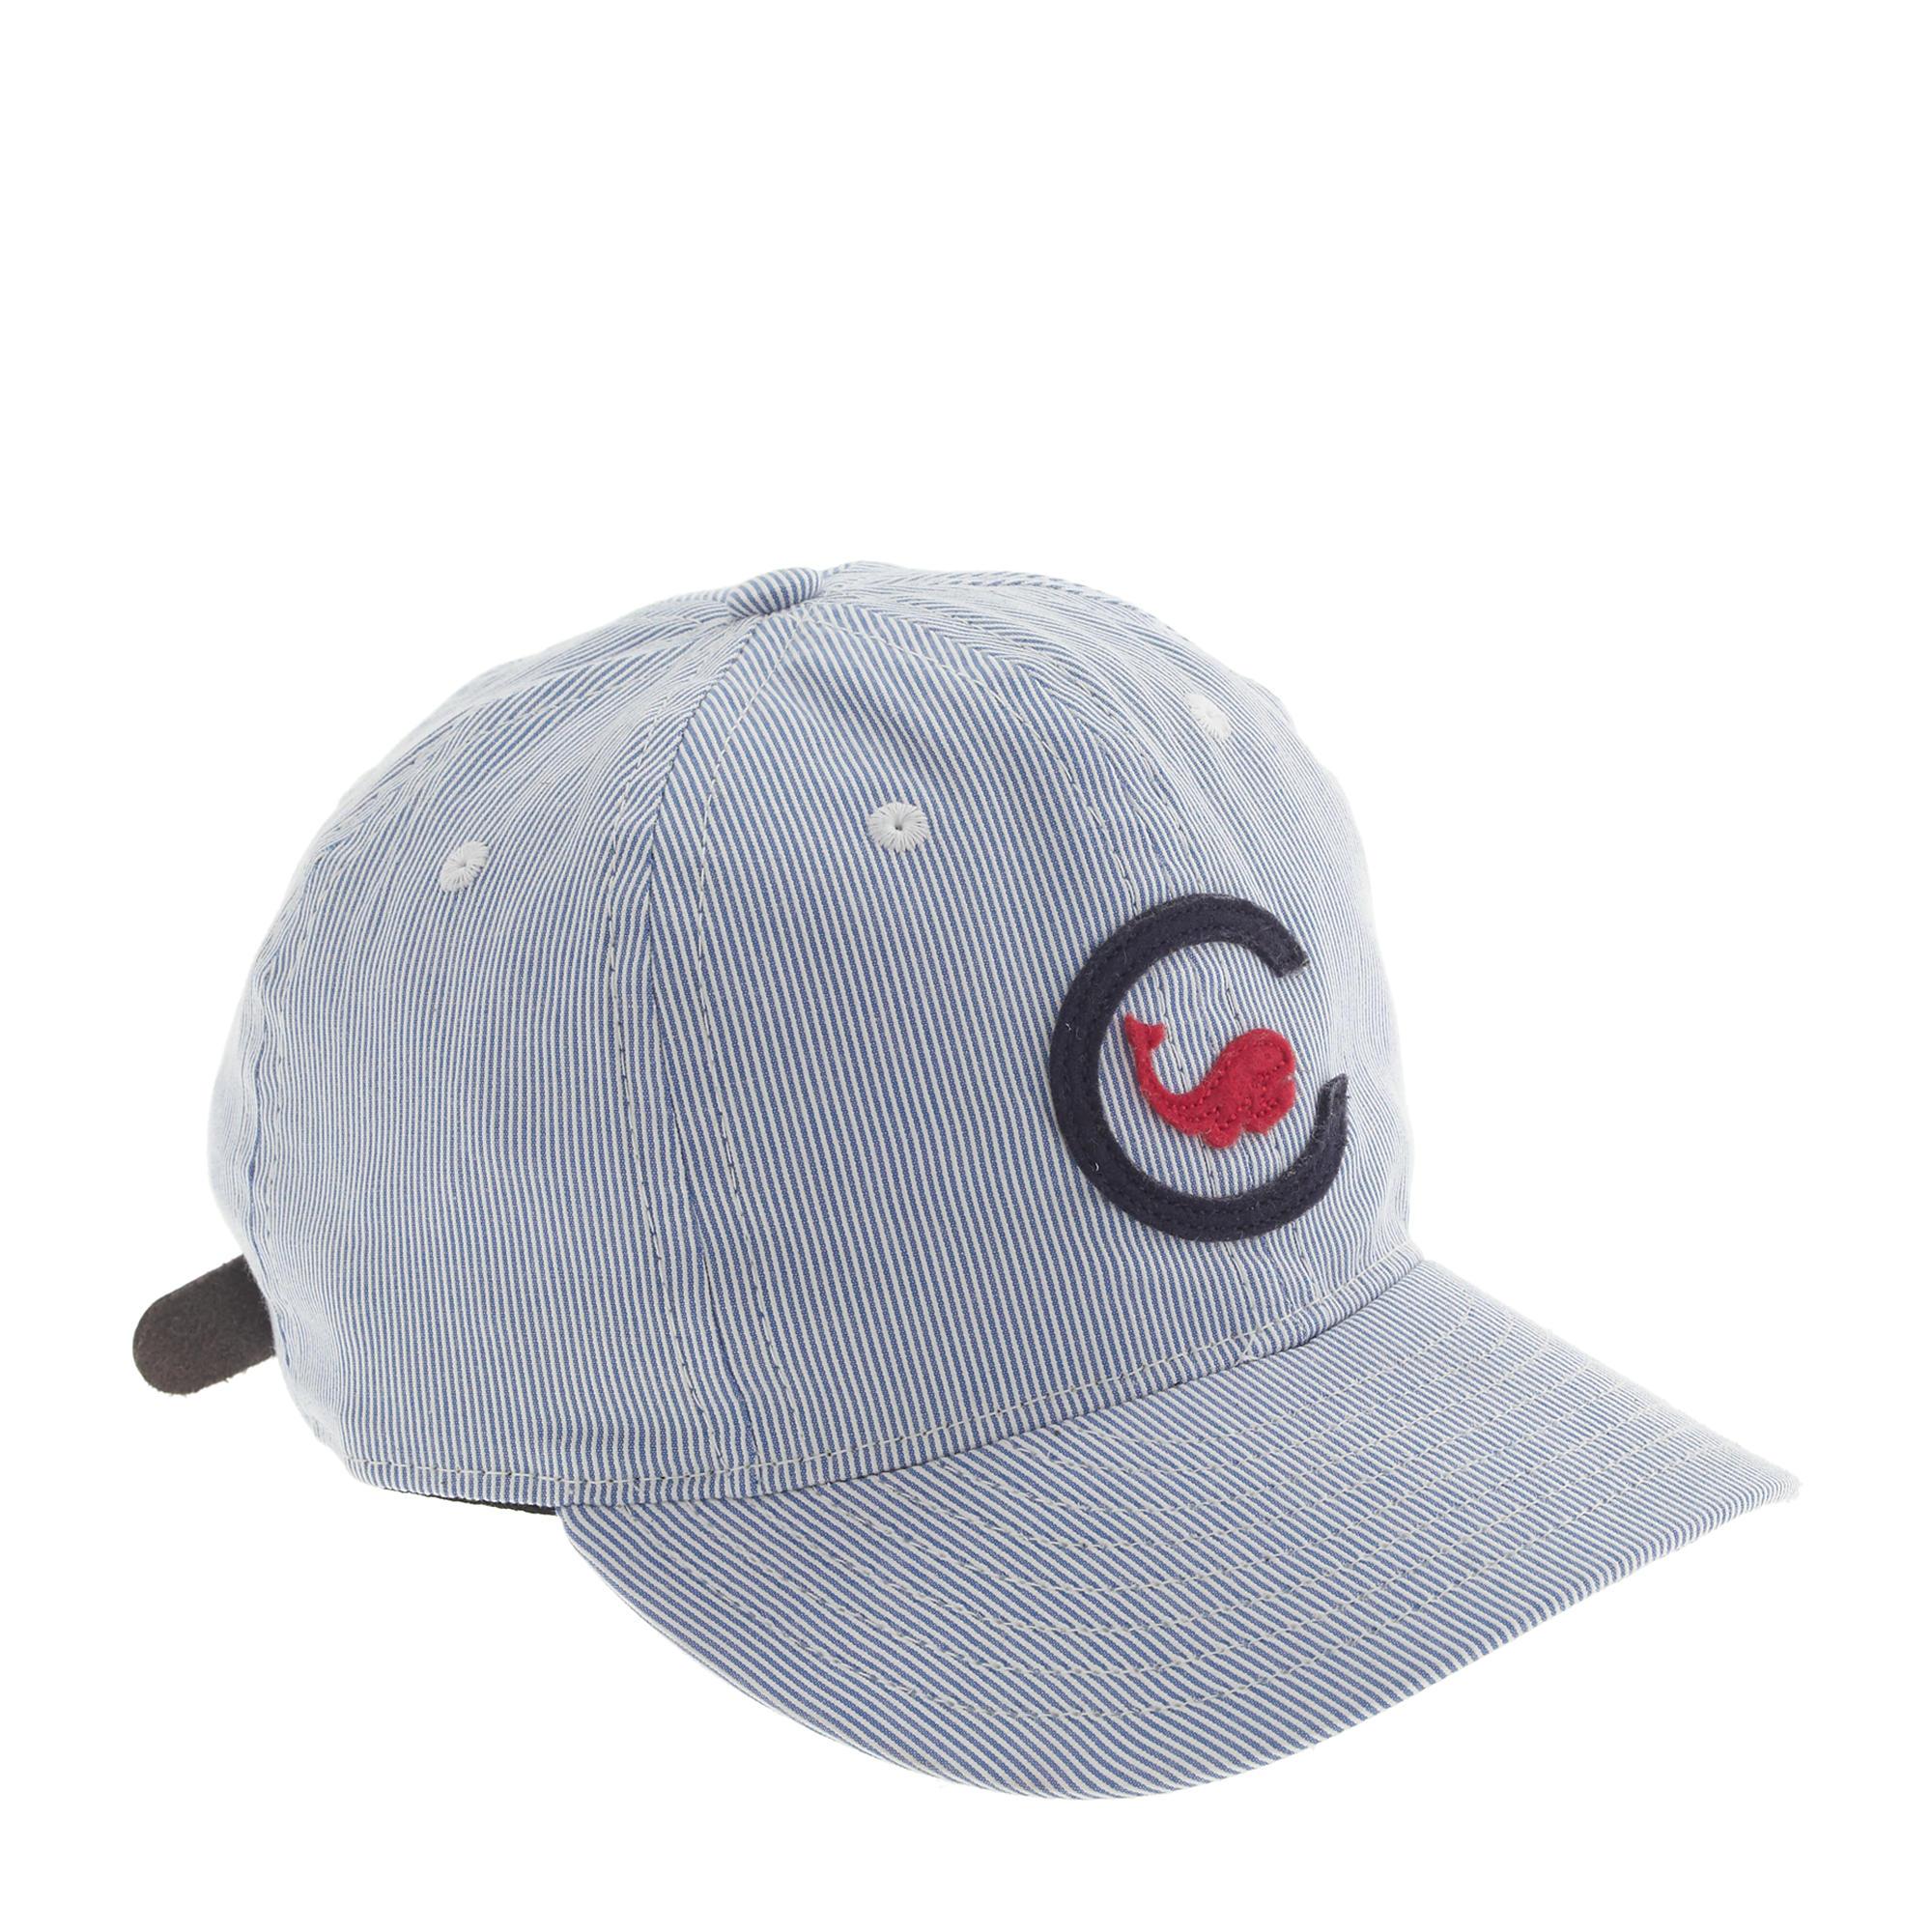 85dddcf3464 J.Crew Ebbets Field Flannels Chicago Whales Ball Cap in Blue for Men ...